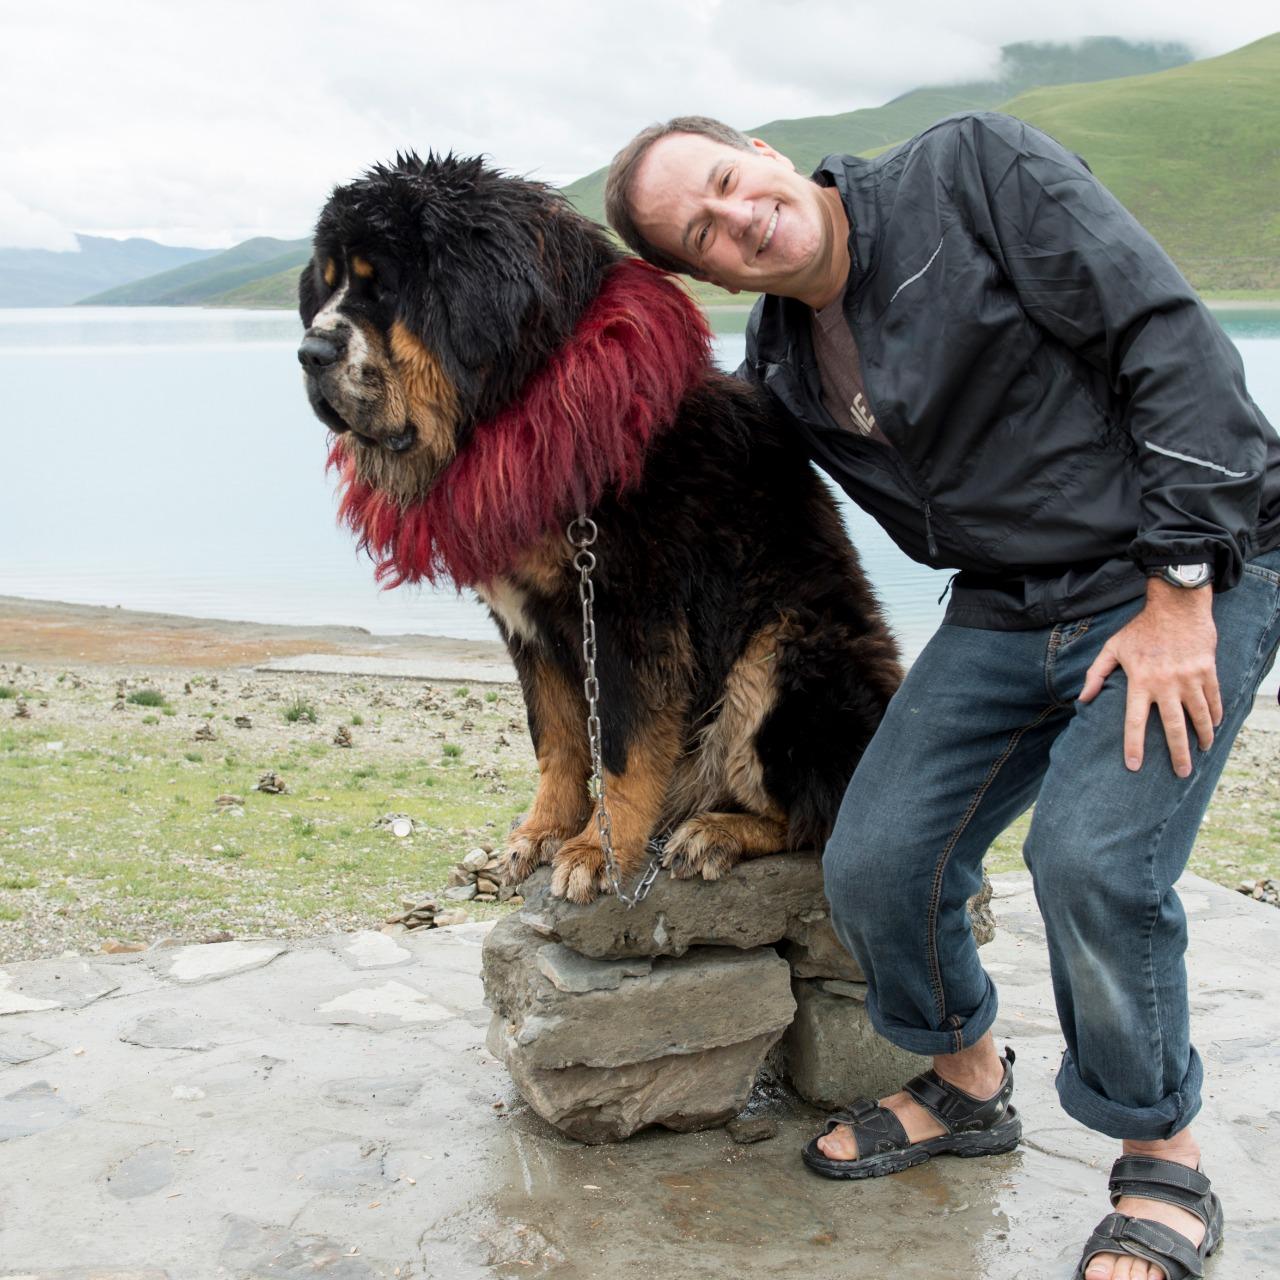 Man posing with decorated Tibetan mastiff dog